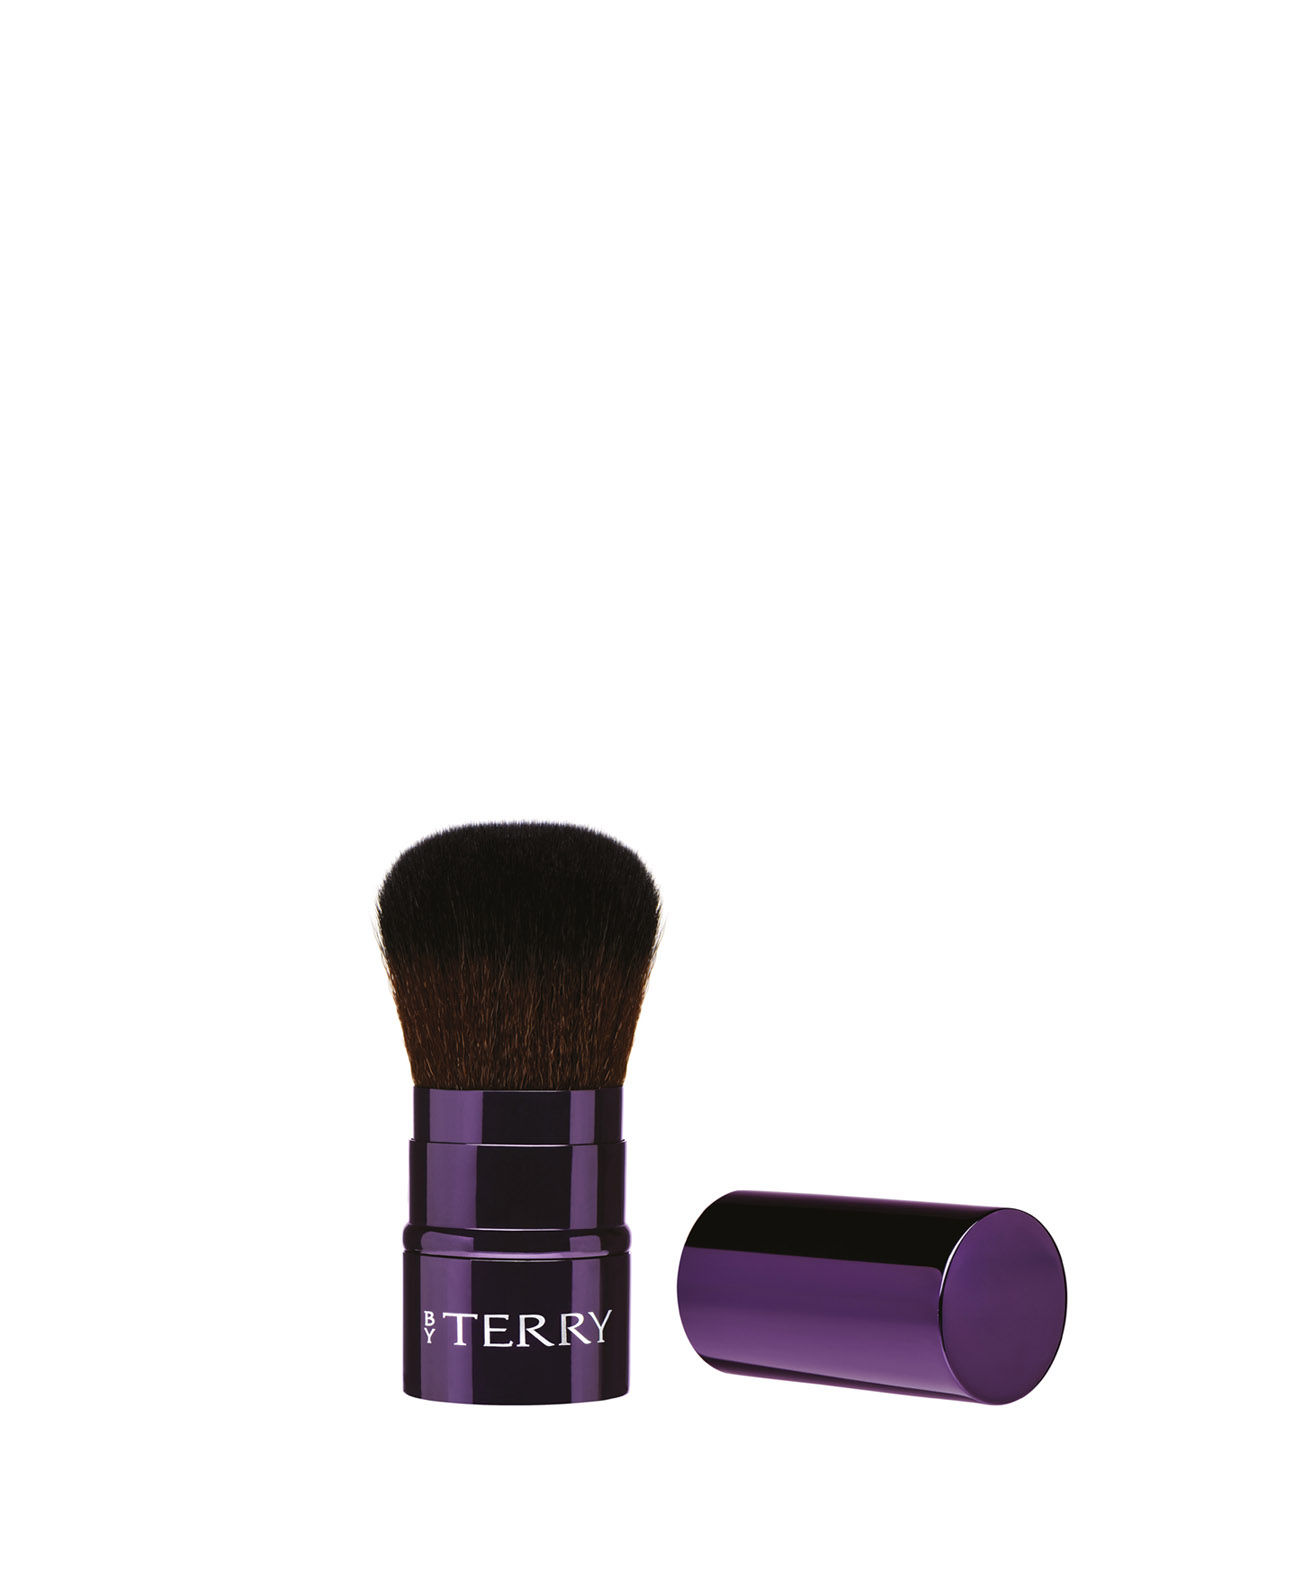 7-Tool-Expert-Kabuki-Brush-pennello-kabuki-retrattile-Linea-accessori-makeup-professionali-By-Terry-Dispar-SpA.jpg